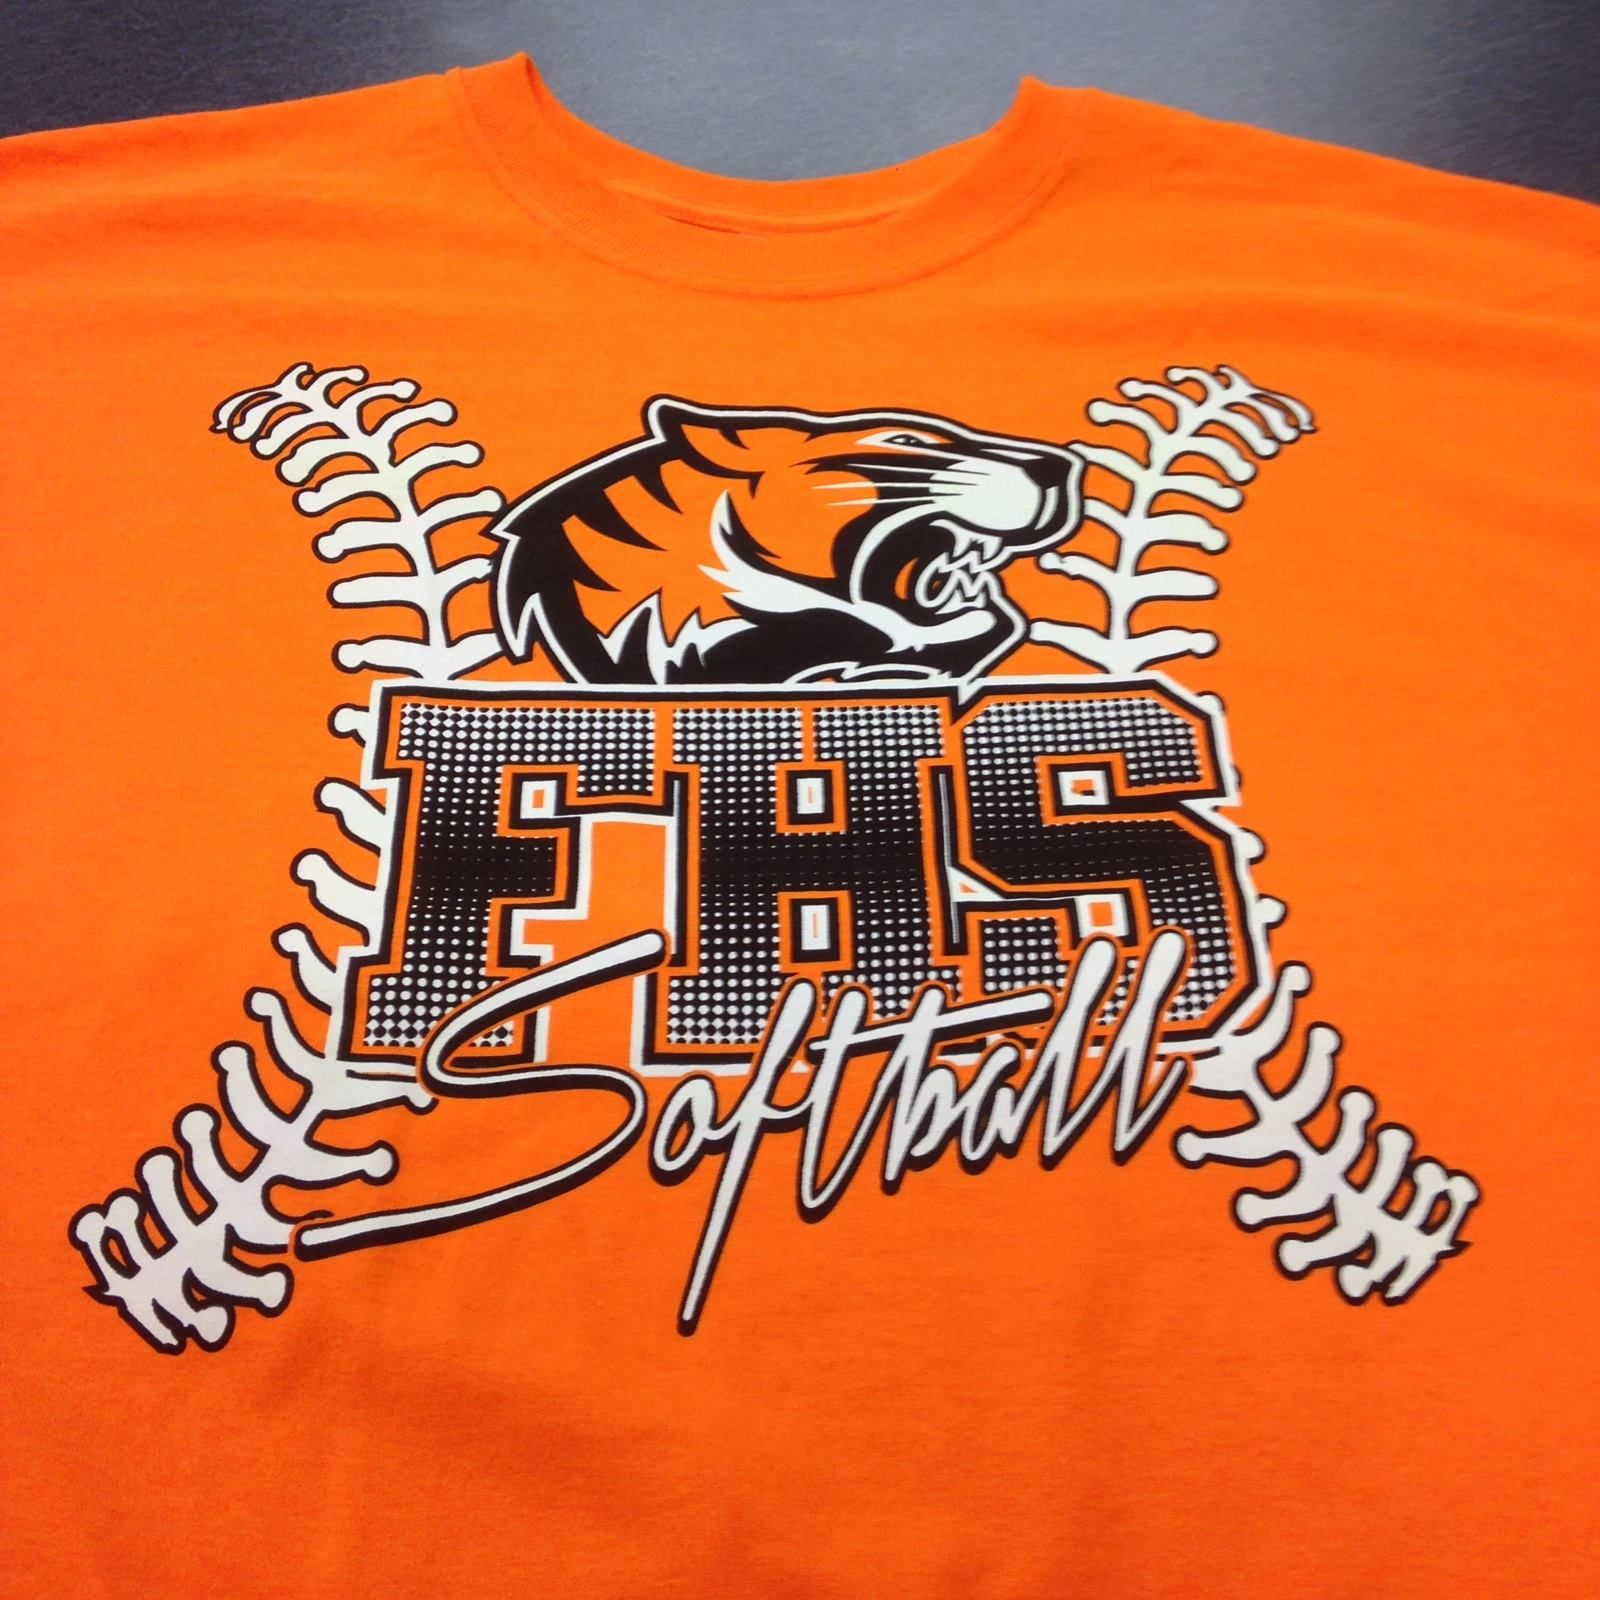 Softball tshirts fayettevillehigh tennessee Screen